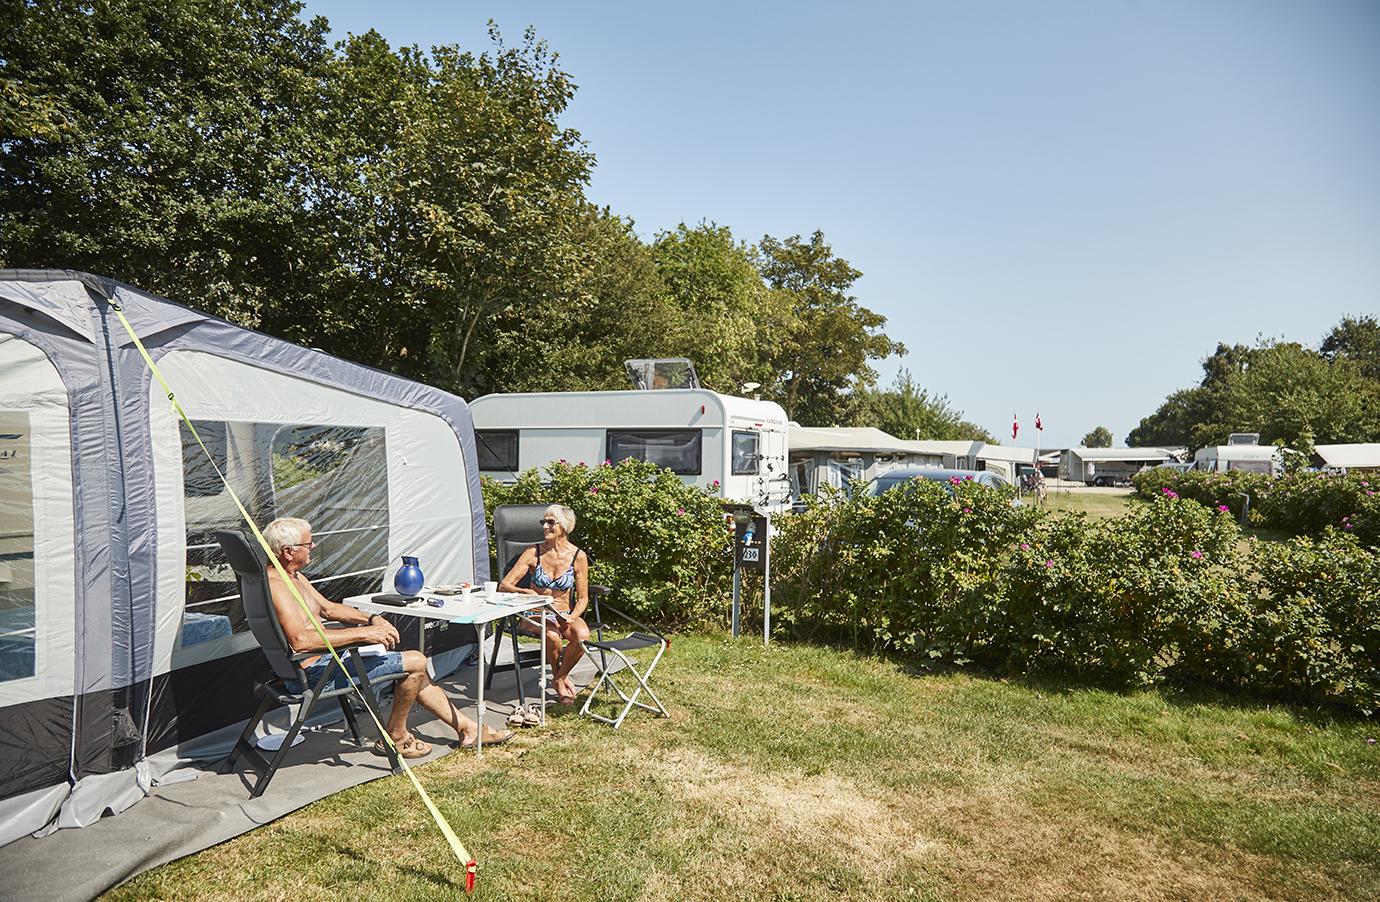 Emplacement - Emplacement Calme - Horsens City Camping